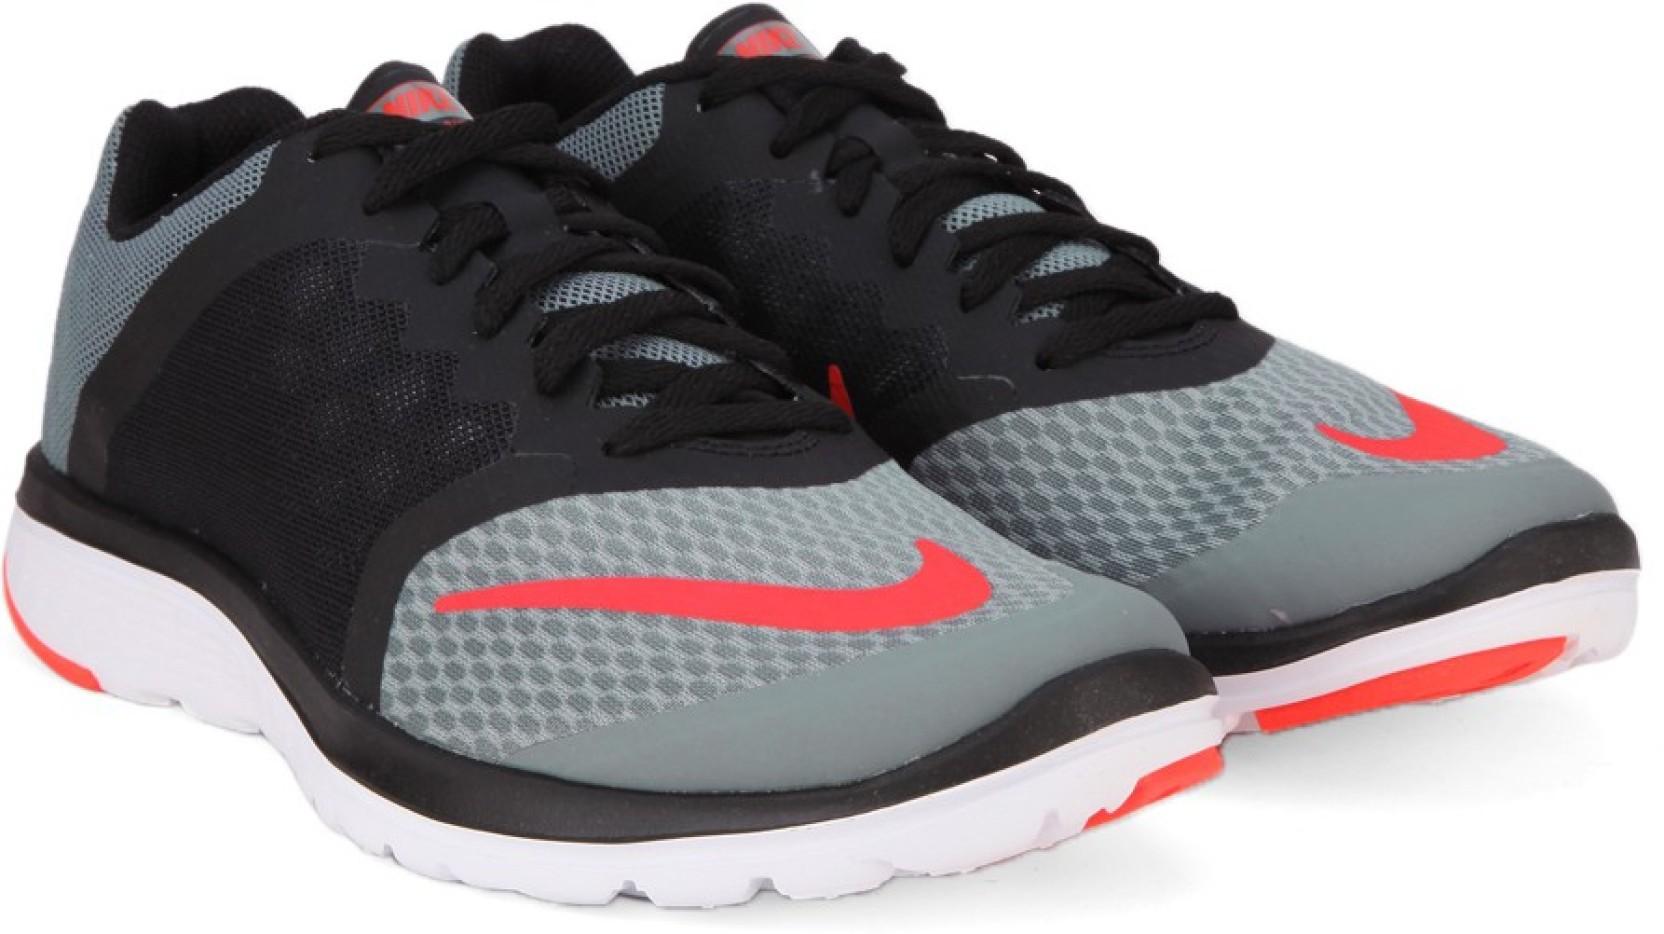 d1b50c60aef nike fs lite run 3 mens running shoes